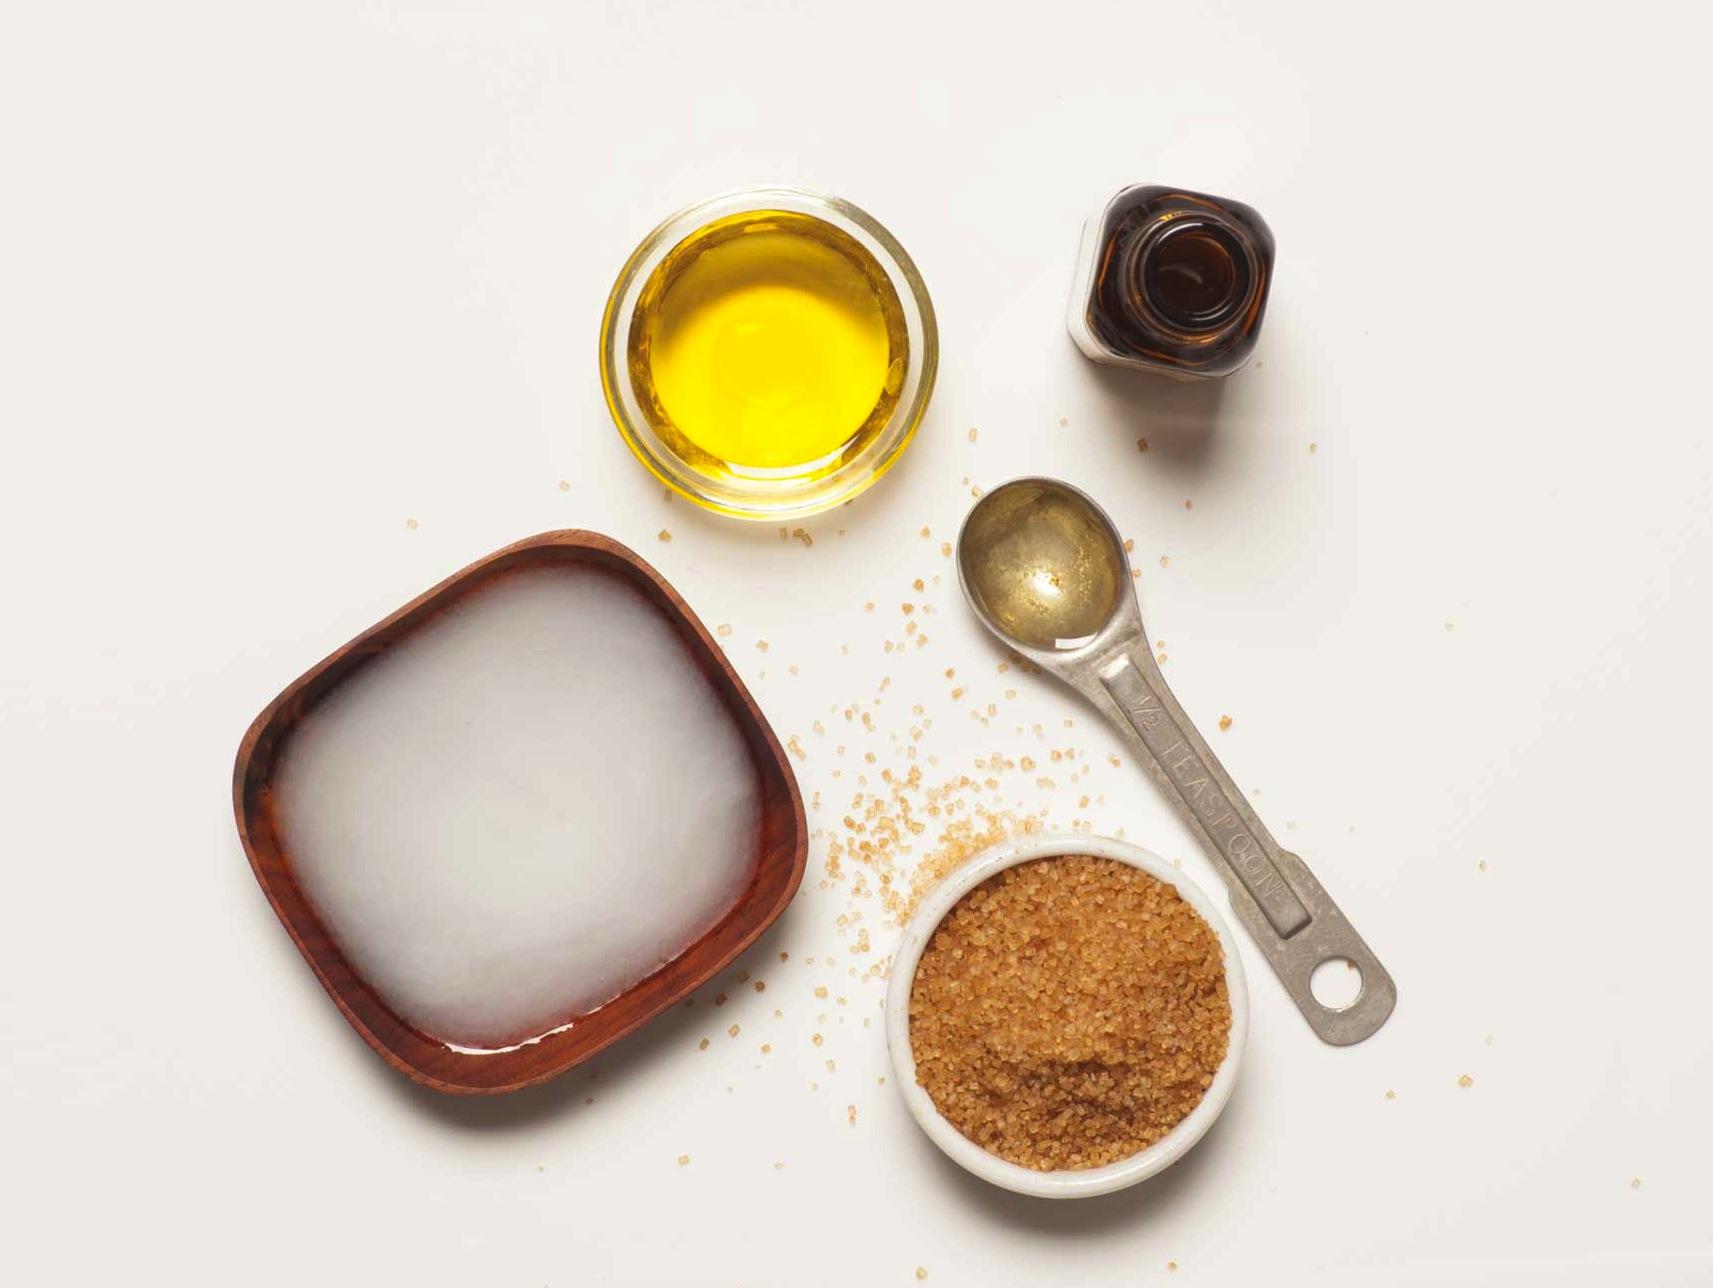 Ingredients for DIY Hand Scrub